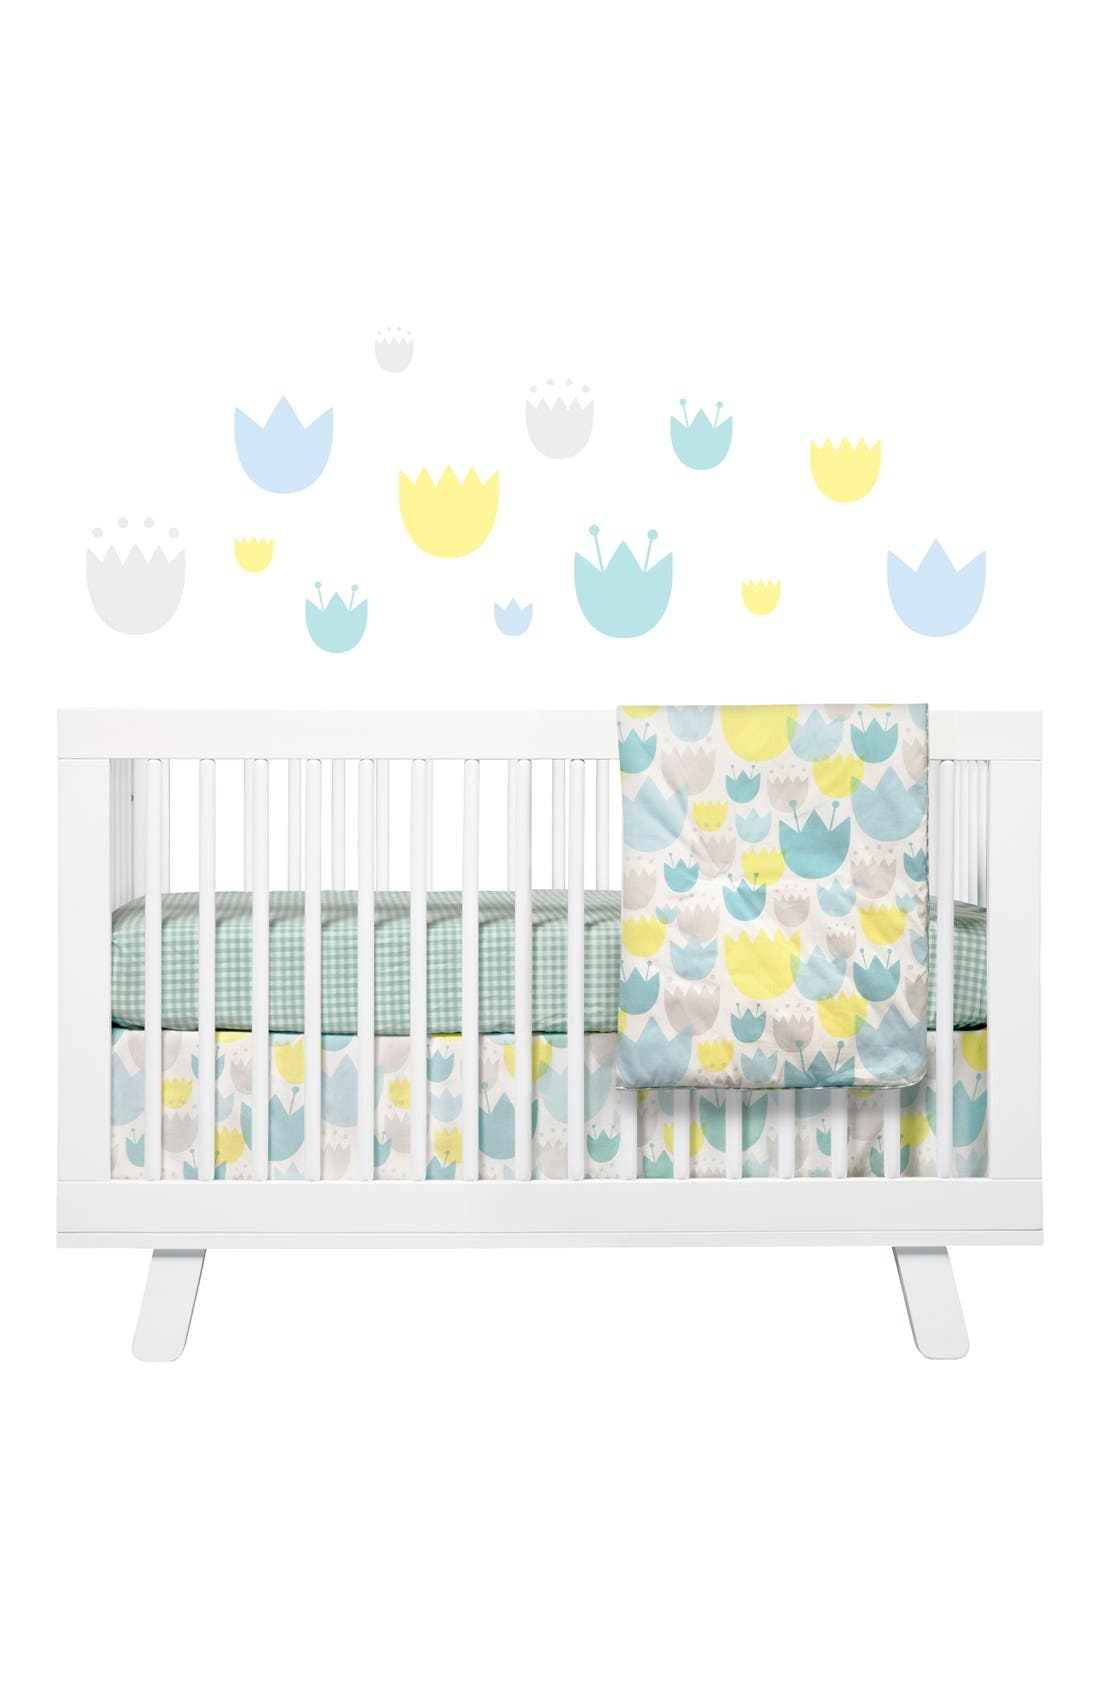 'Garden' Crib Sheet, Crib Skirt, Stroller Blanket & Wall Decals,                             Alternate thumbnail 6, color,                             Blue